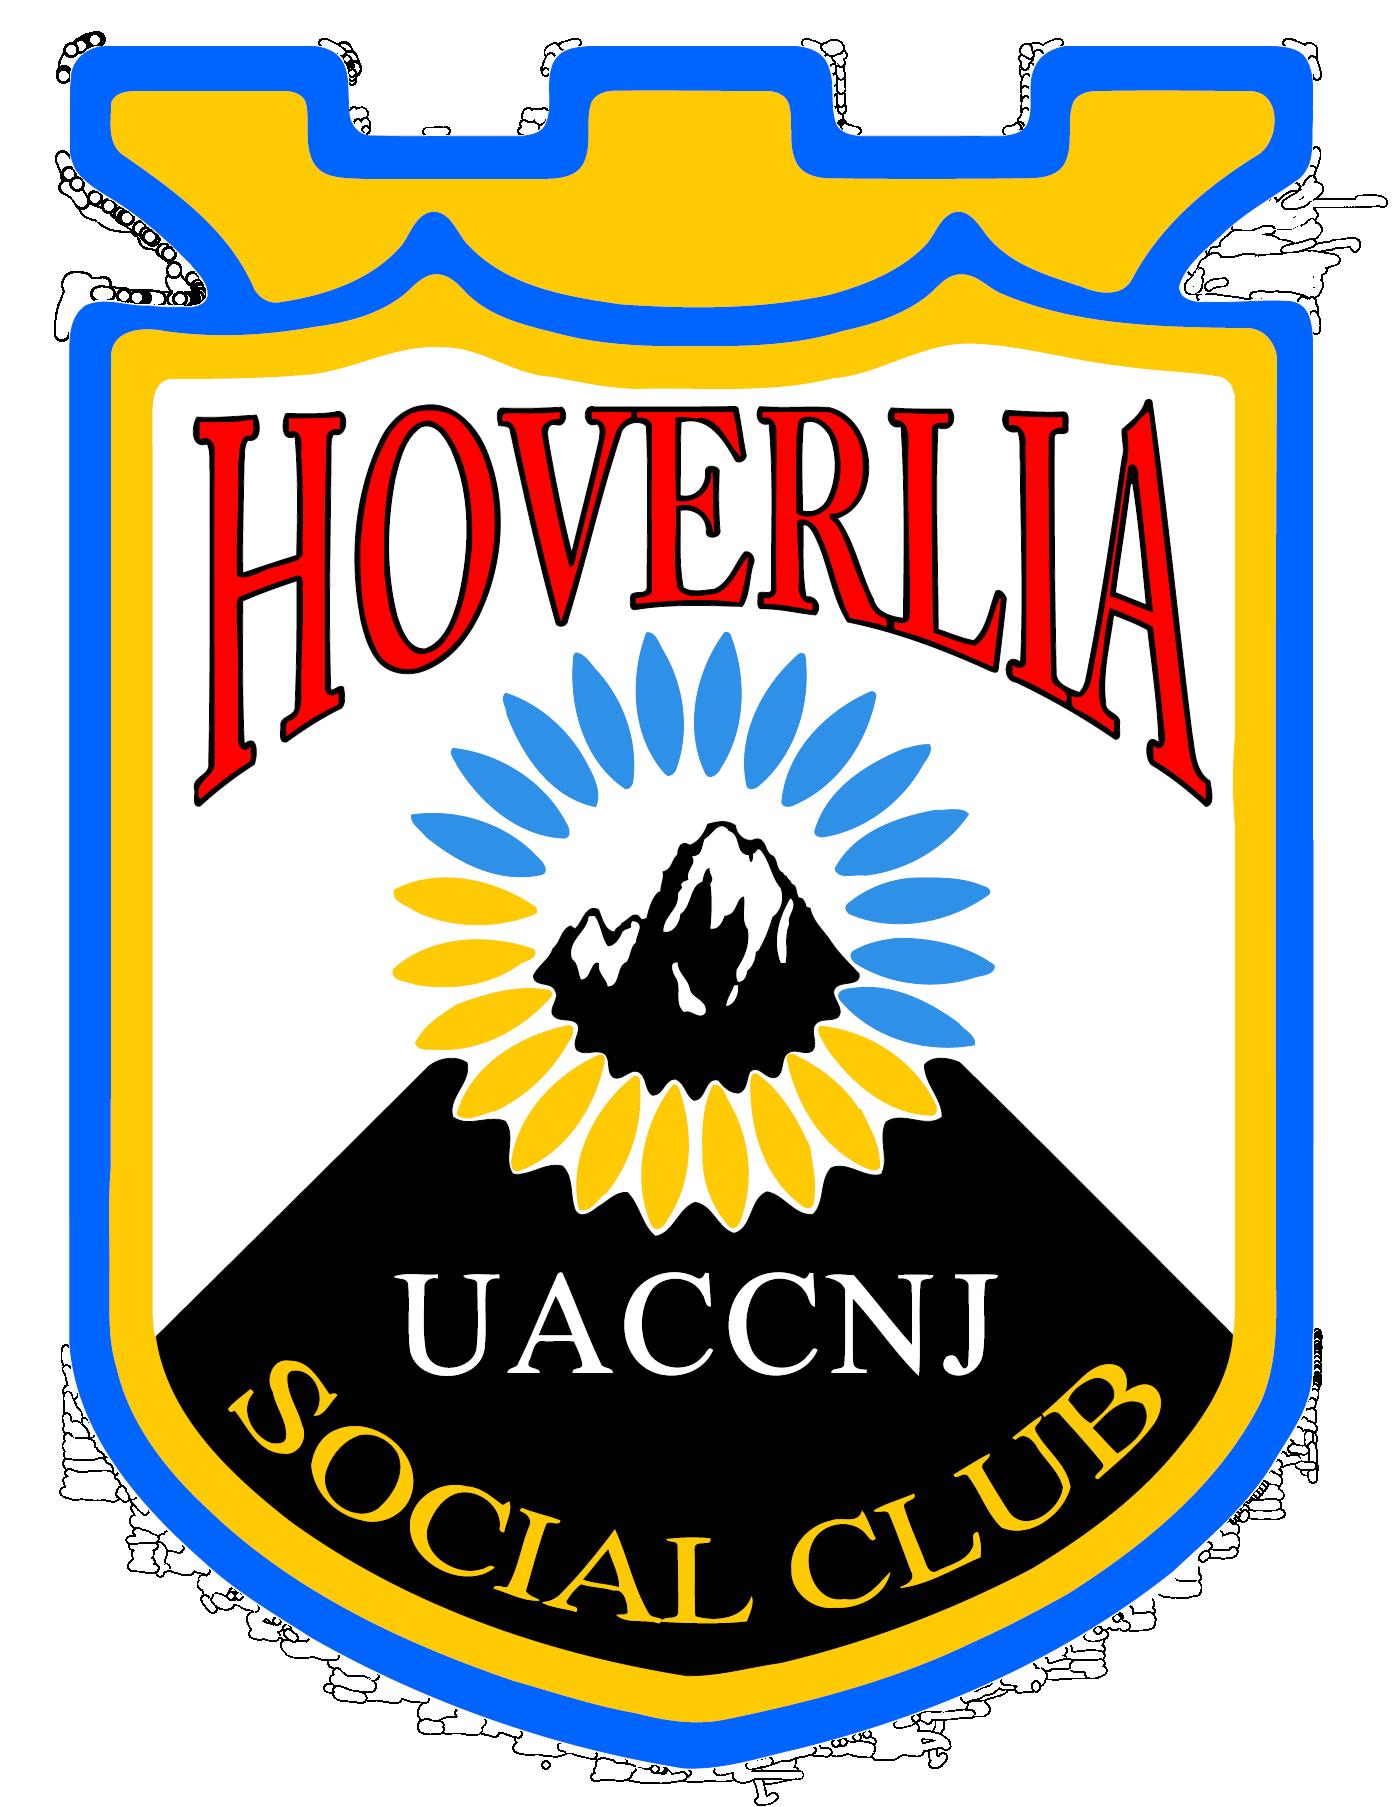 Hoverlia logo Hoverlia logo